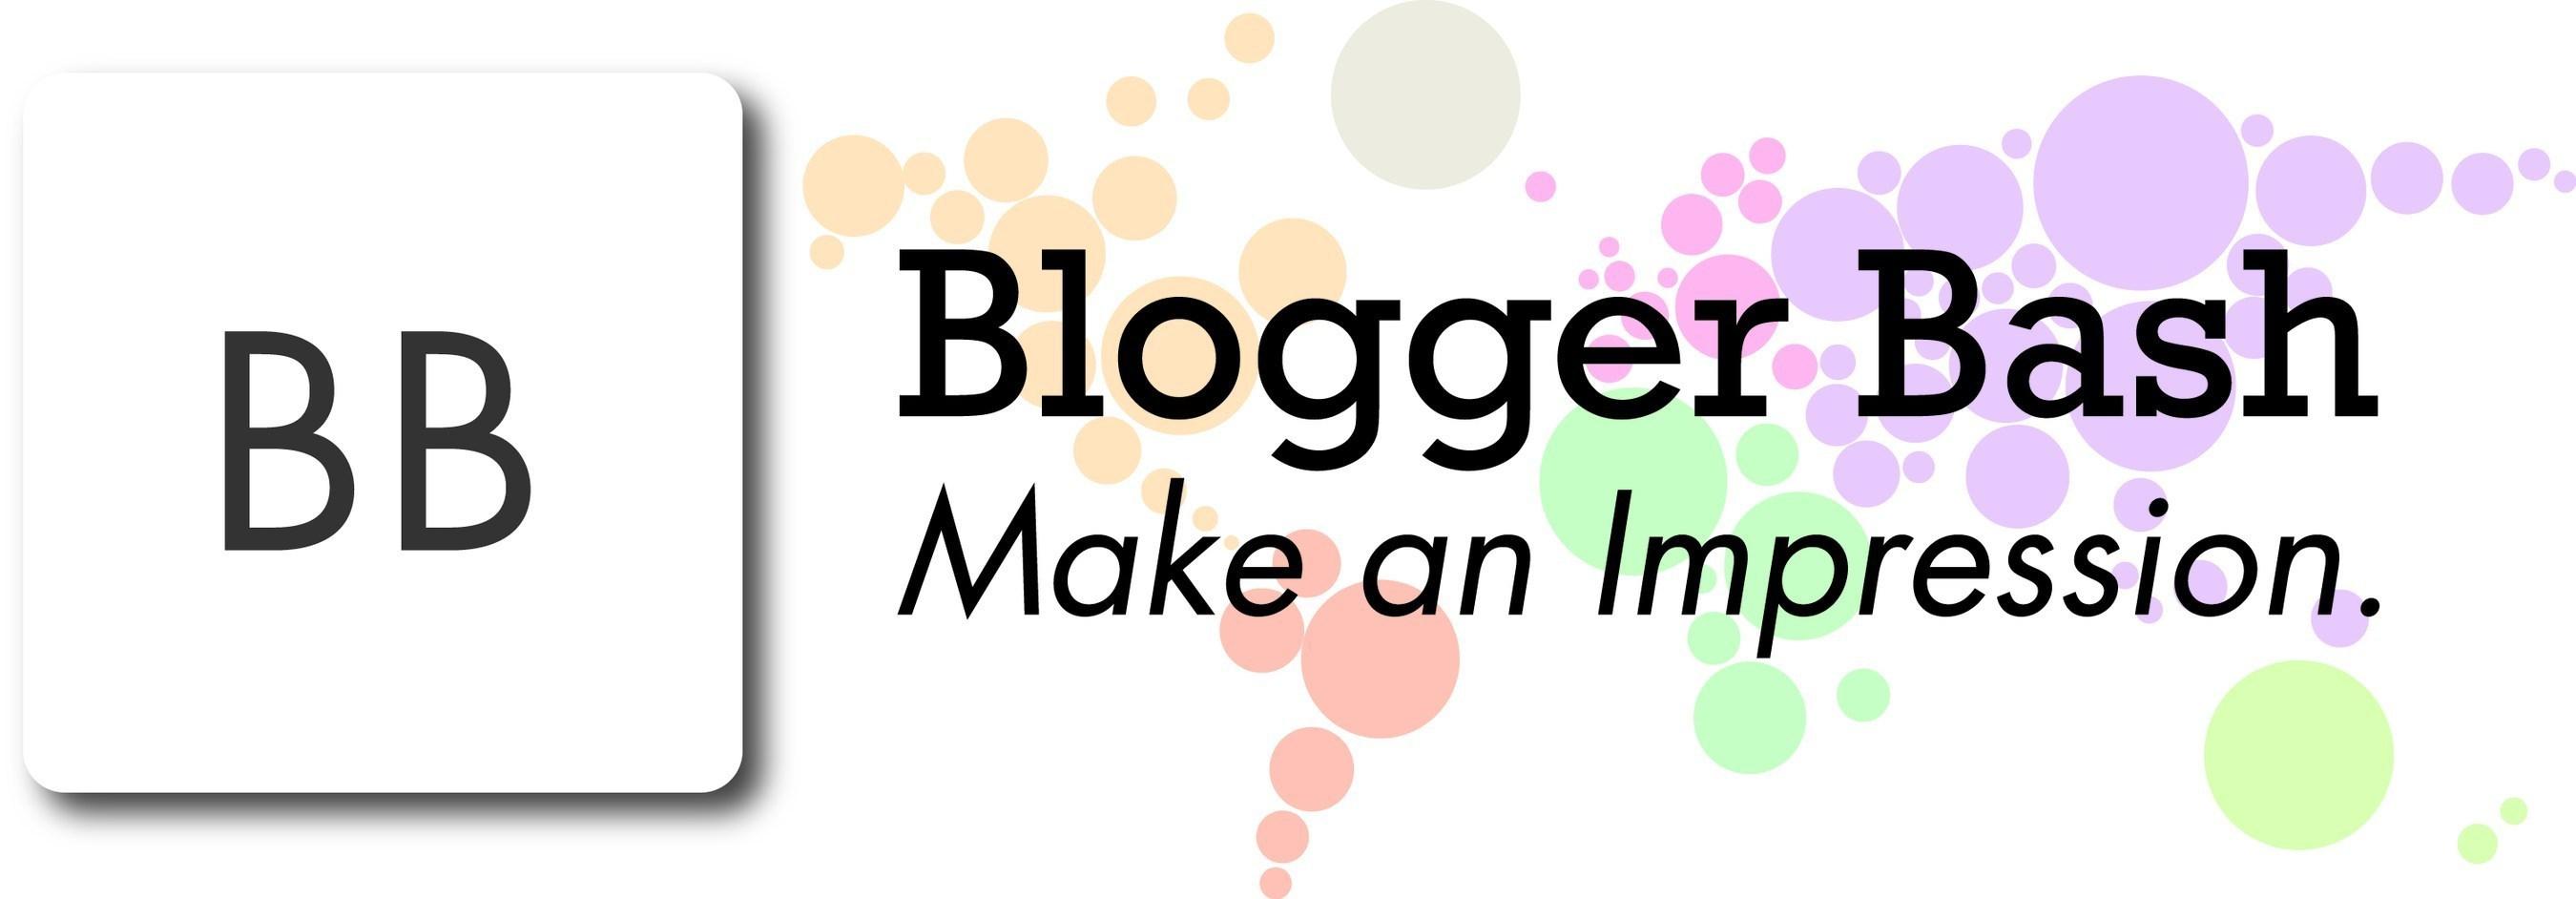 Blogger Bash Logo